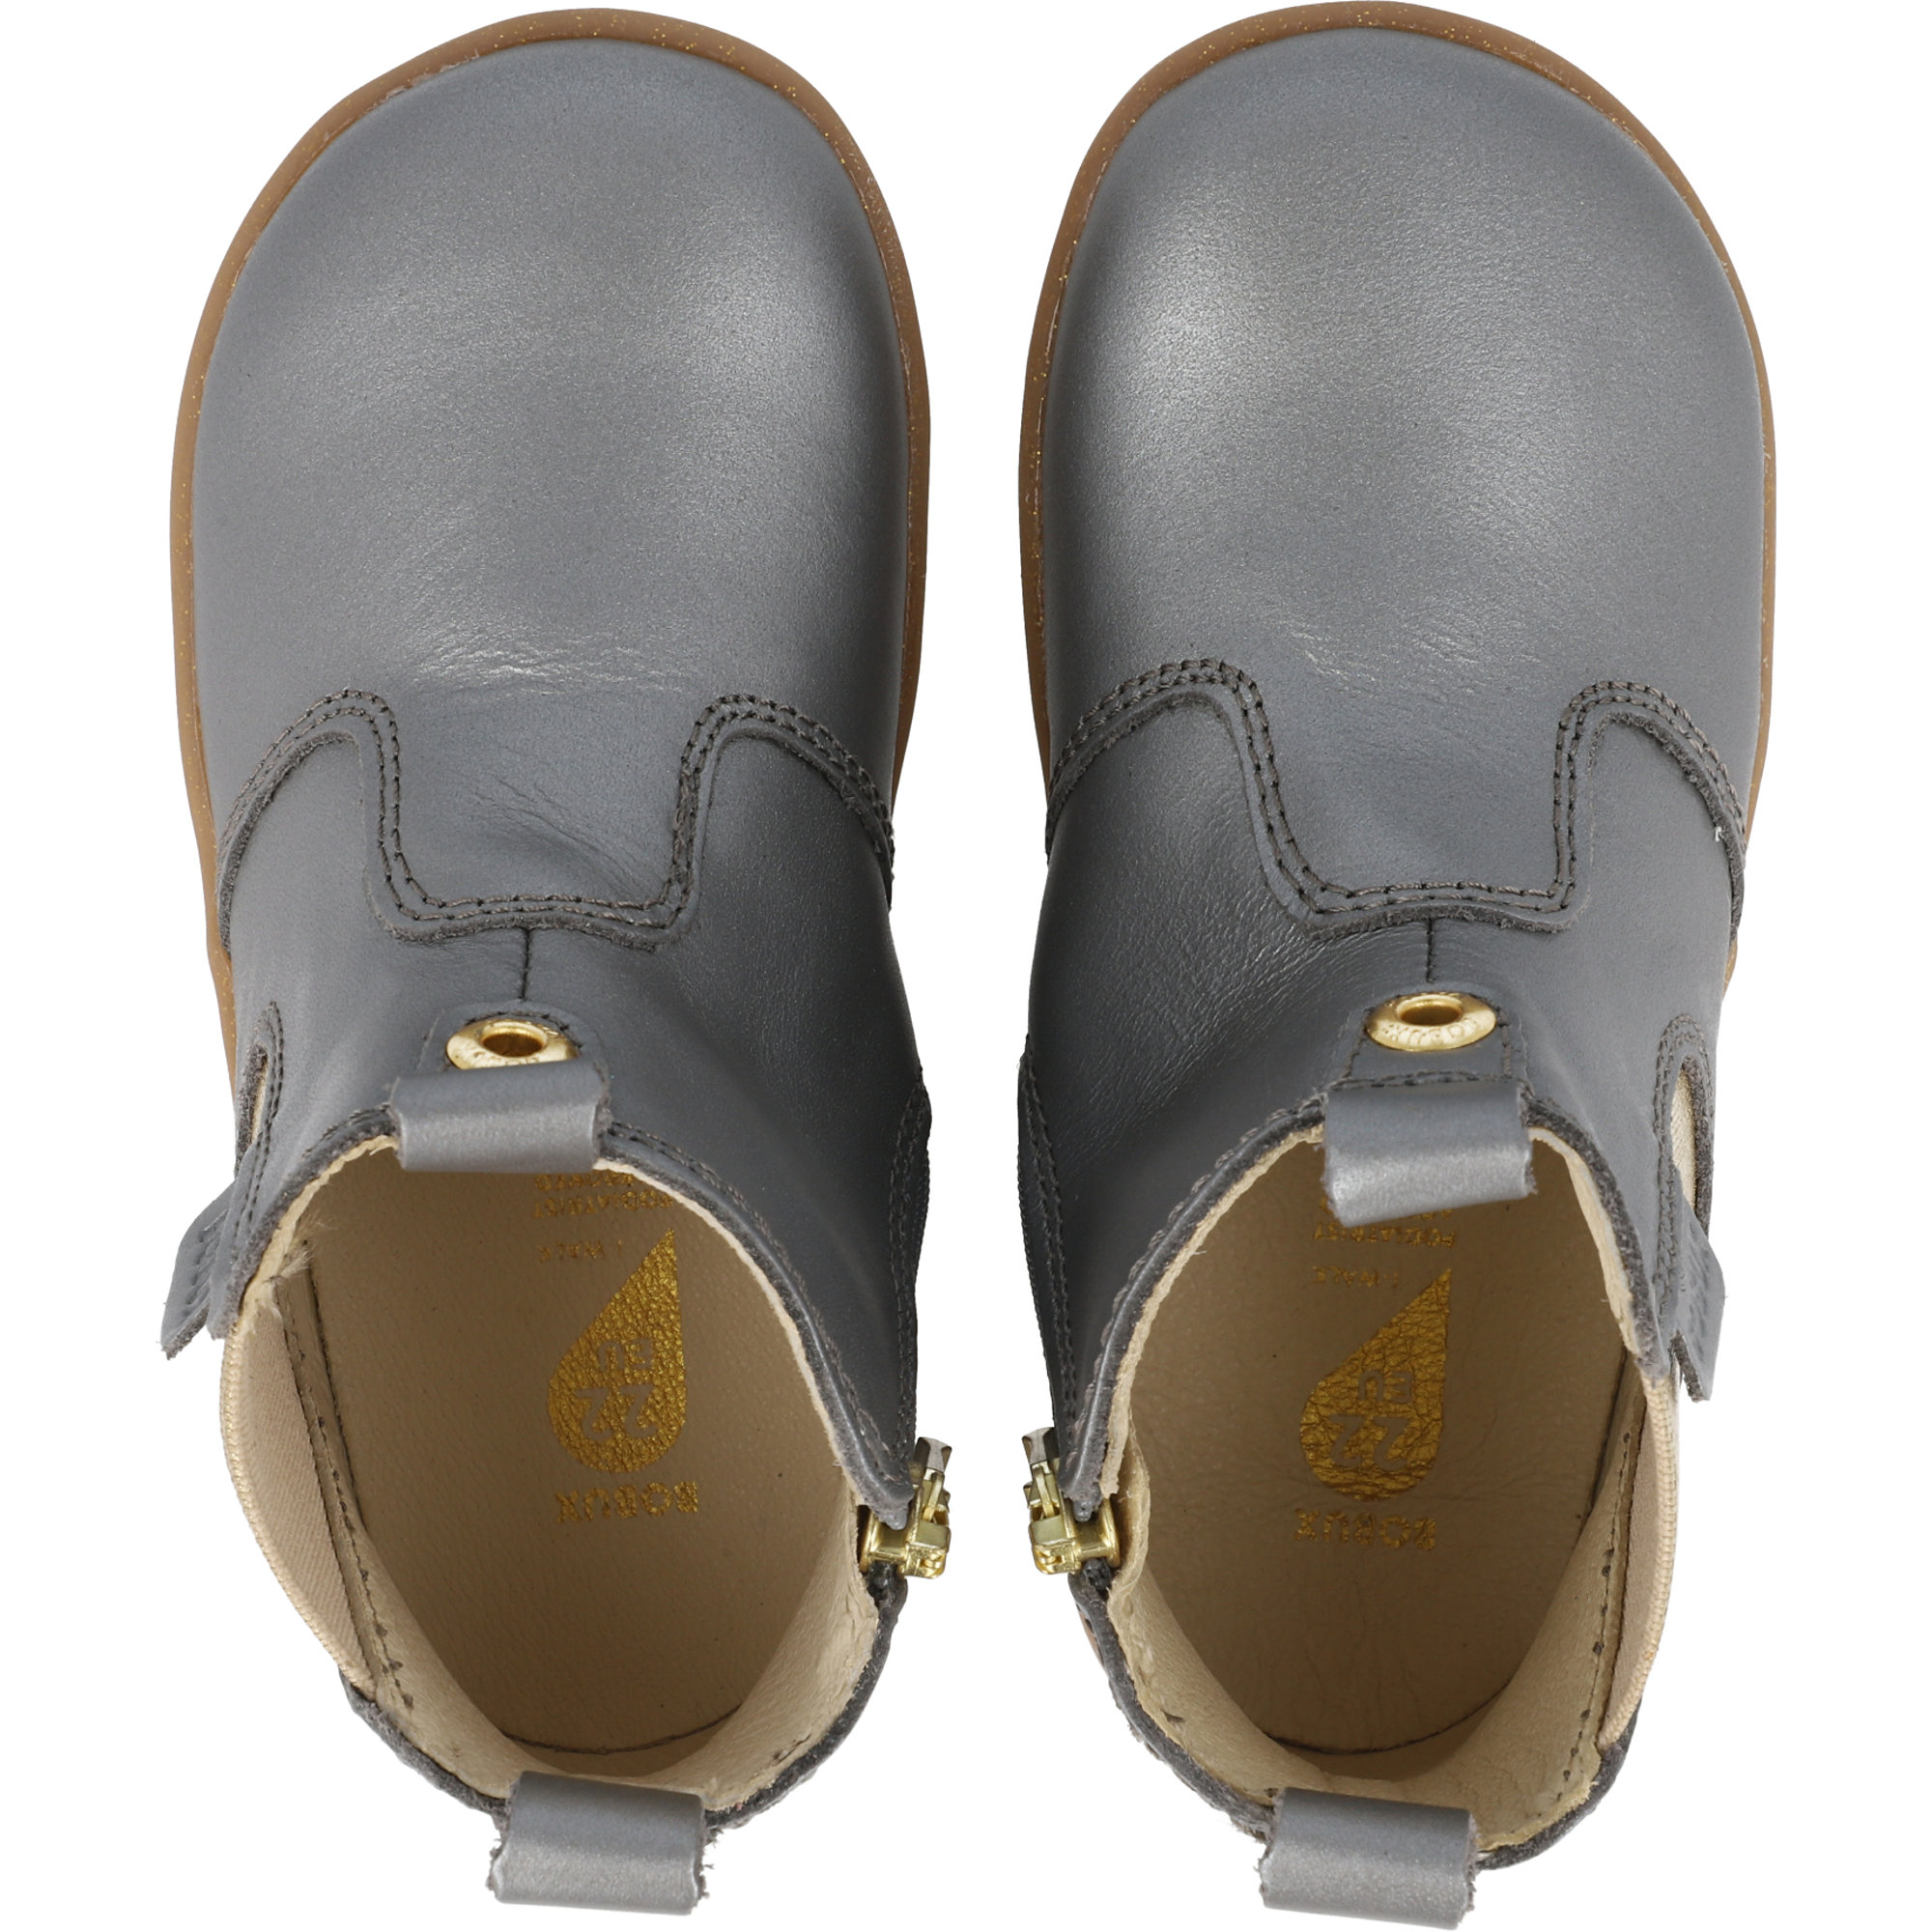 Bobux i-Walk Jodhpur Charcoal Shimmer Quickdry Metallic Leather